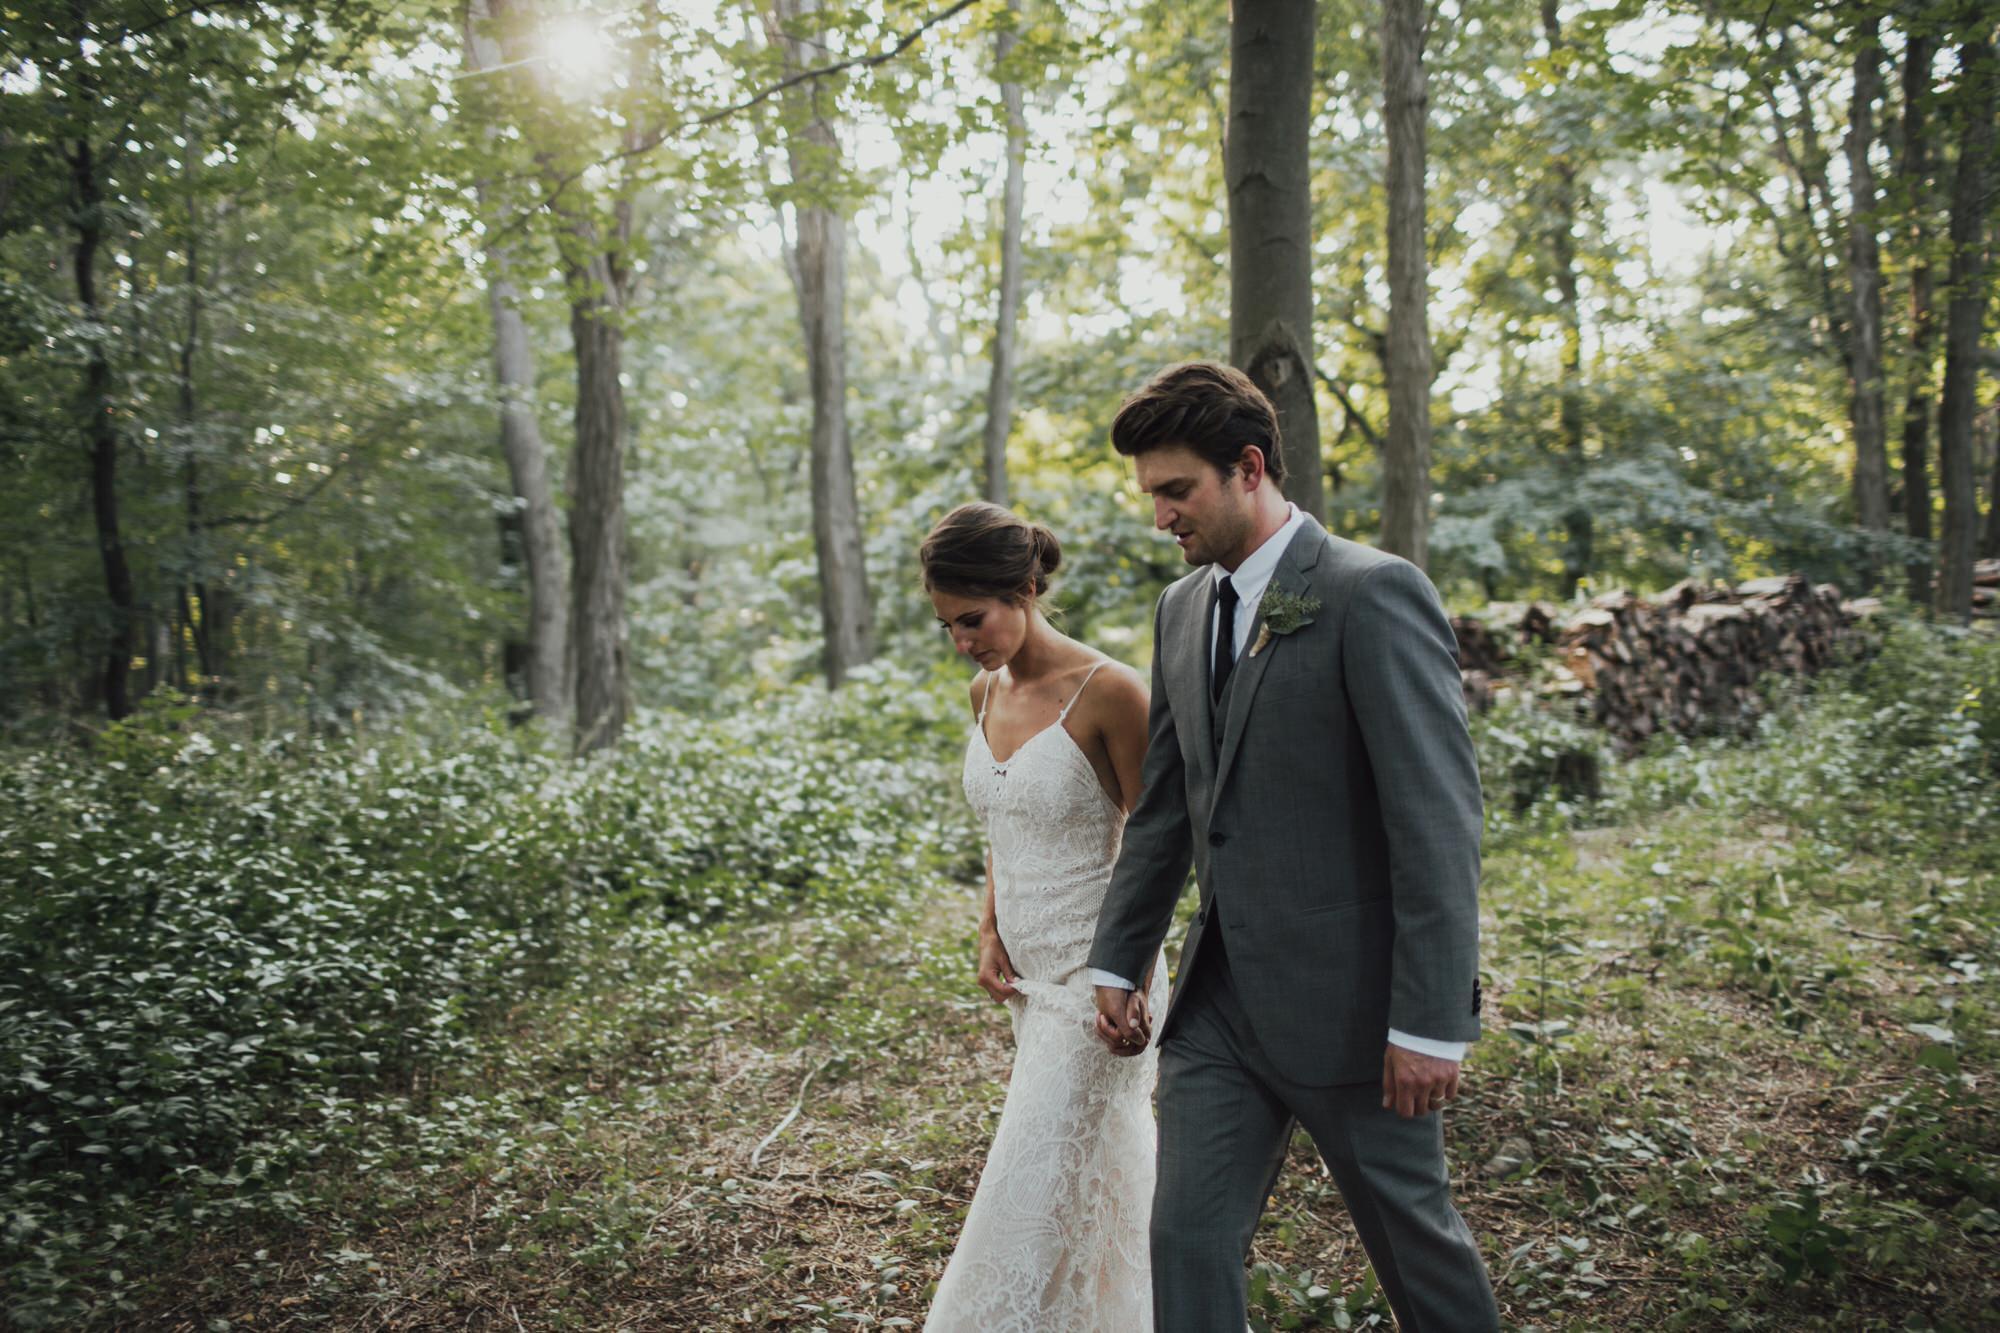 emily-aaron-rochester-new-york-wedding-photographer-96.JPG